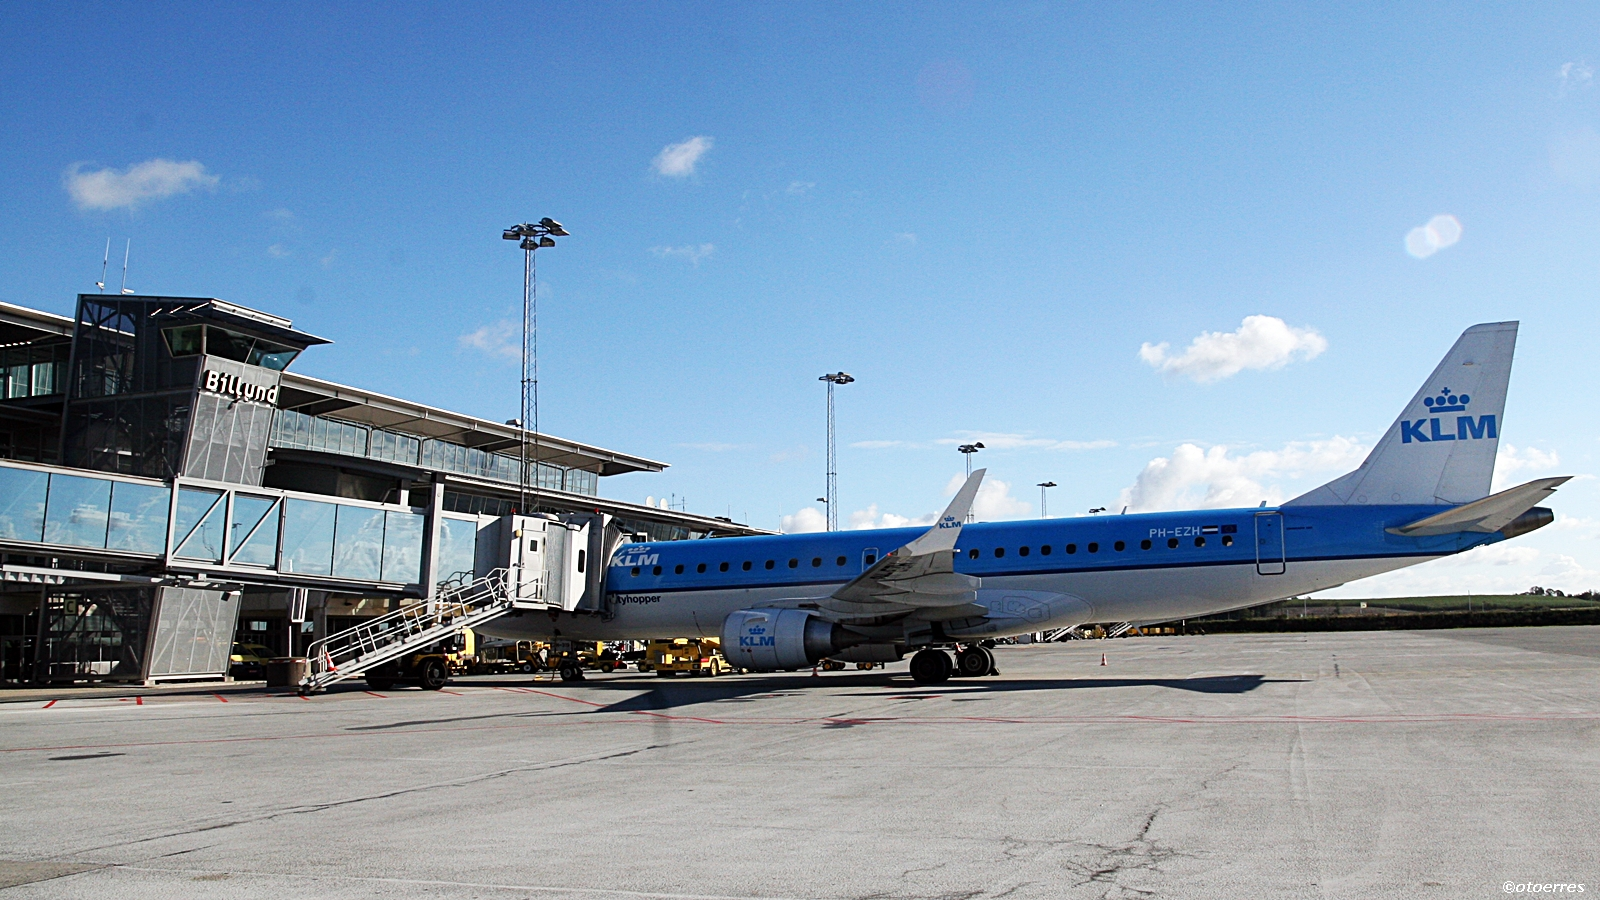 Billund - Danmark - KLM - Embraer